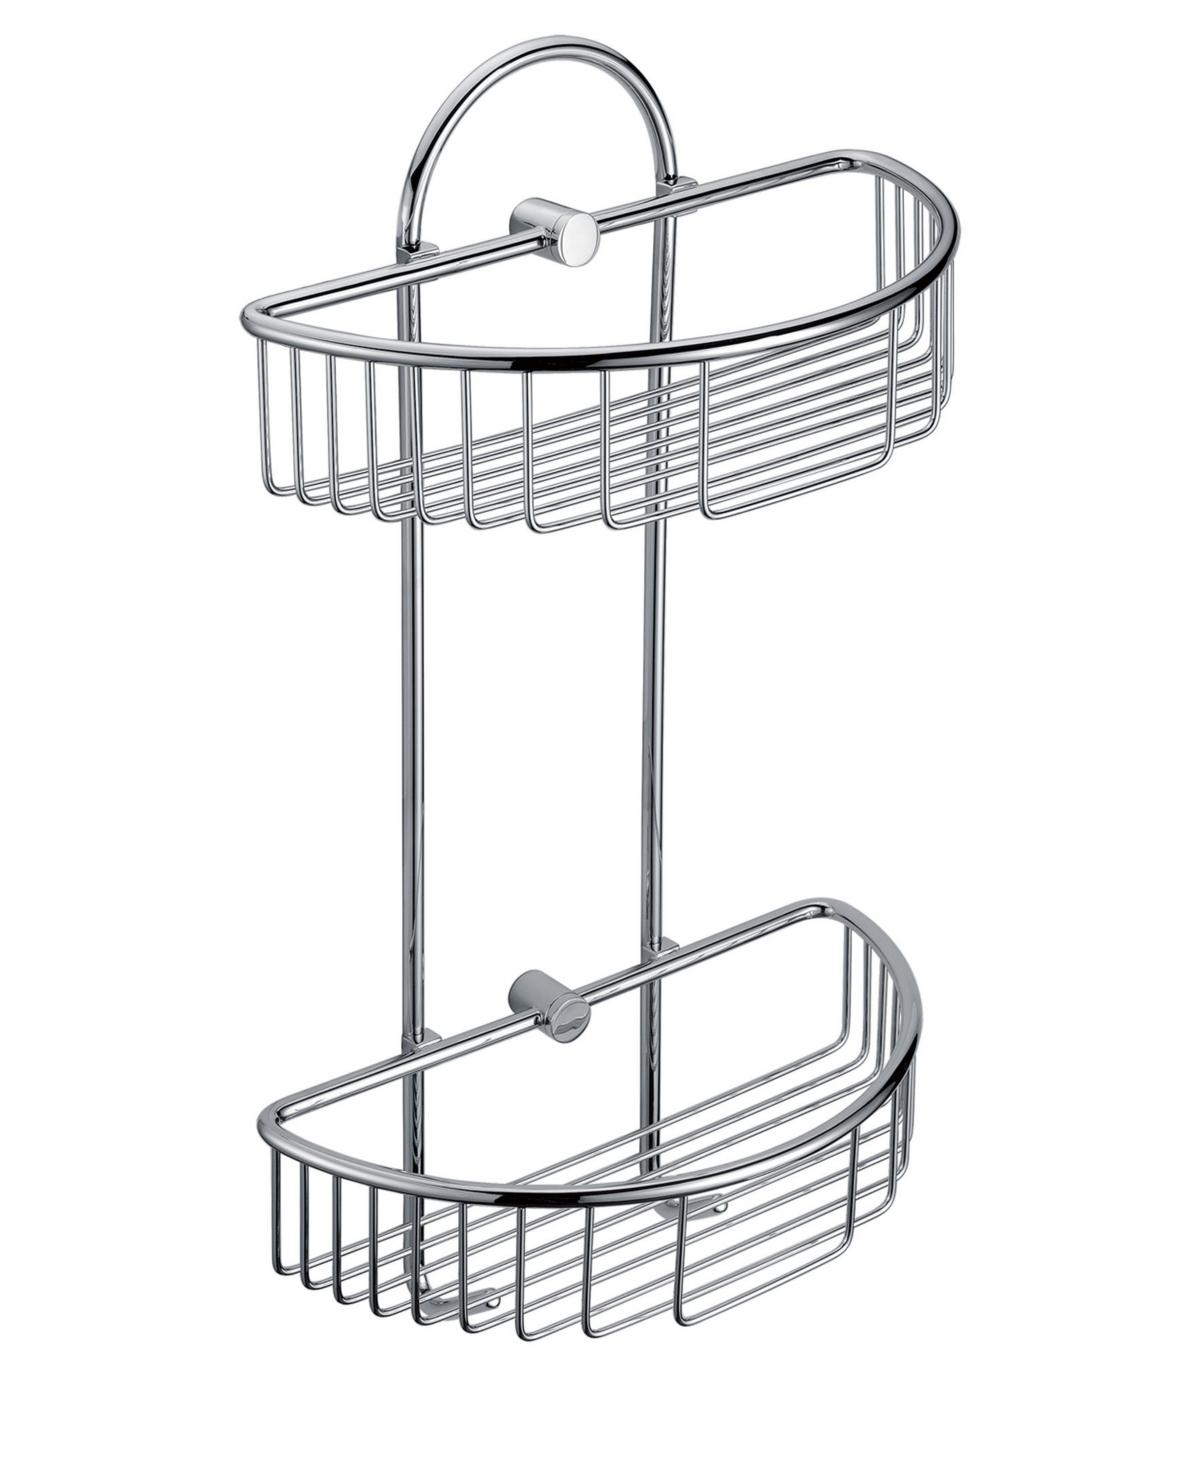 Alfi brand Polished Chrome Wall Mounted Double Basket Shower Shelf Bathroom Accessory Bedding